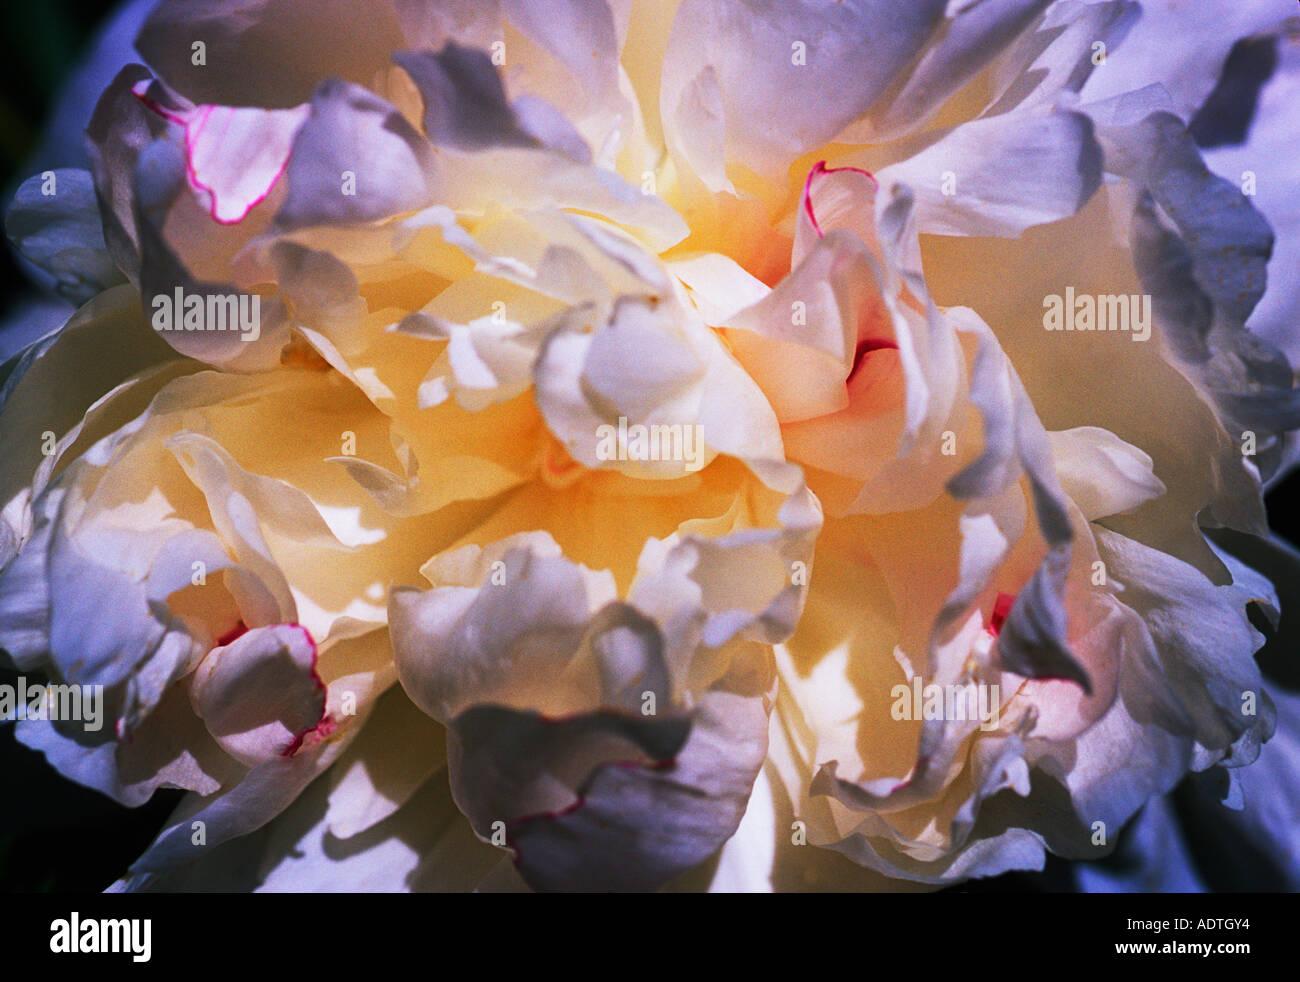 One Peony Close Up Abstract Sandra Baker - Stock Image